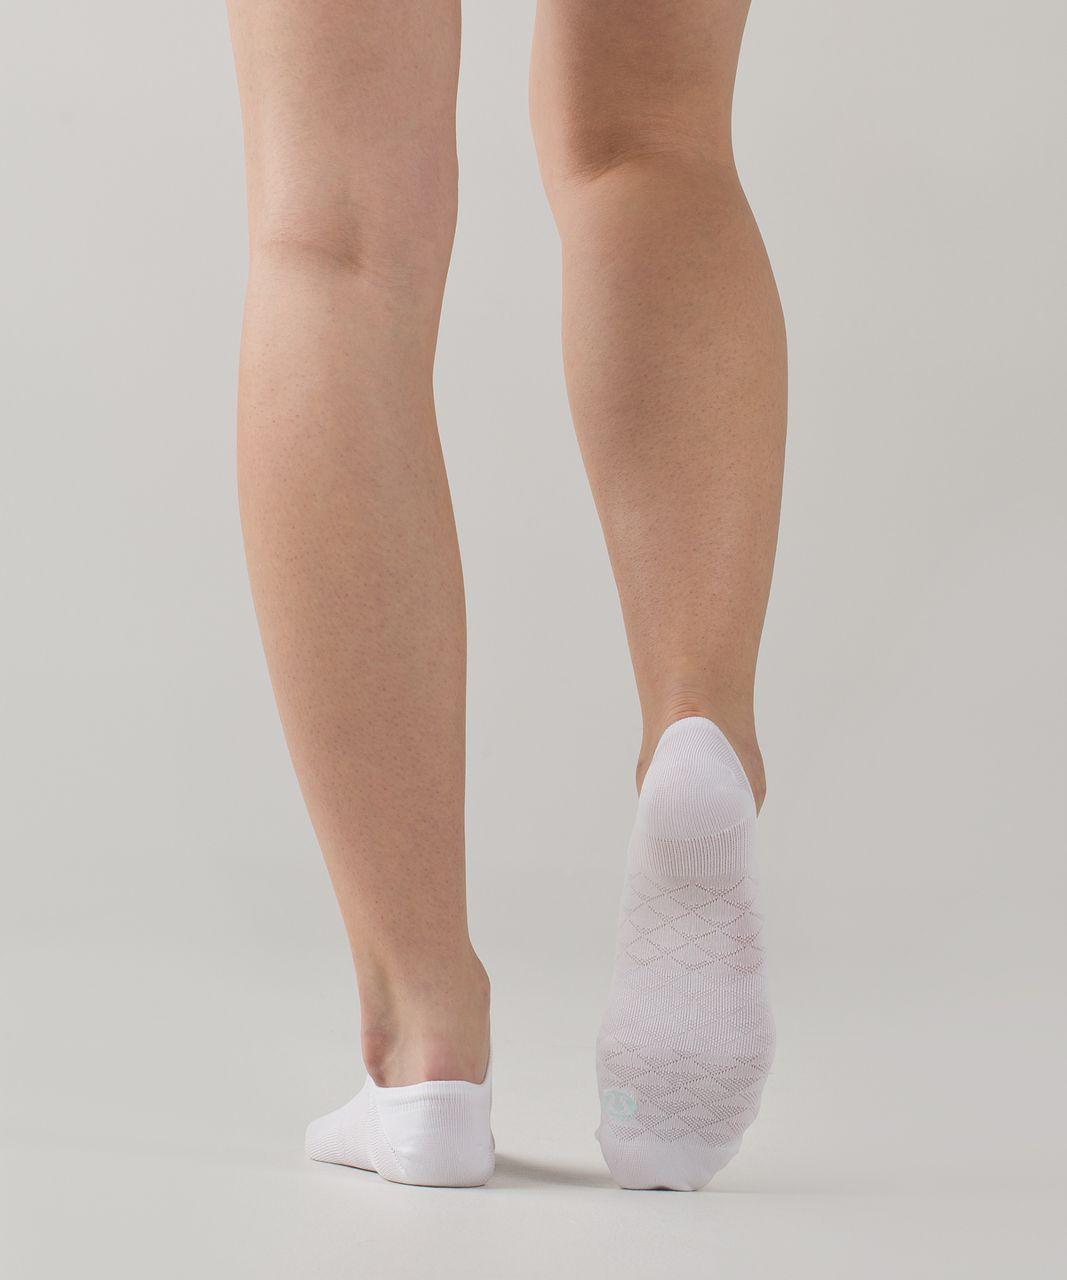 Lululemon Play All Day Sock - White / Sea Mist